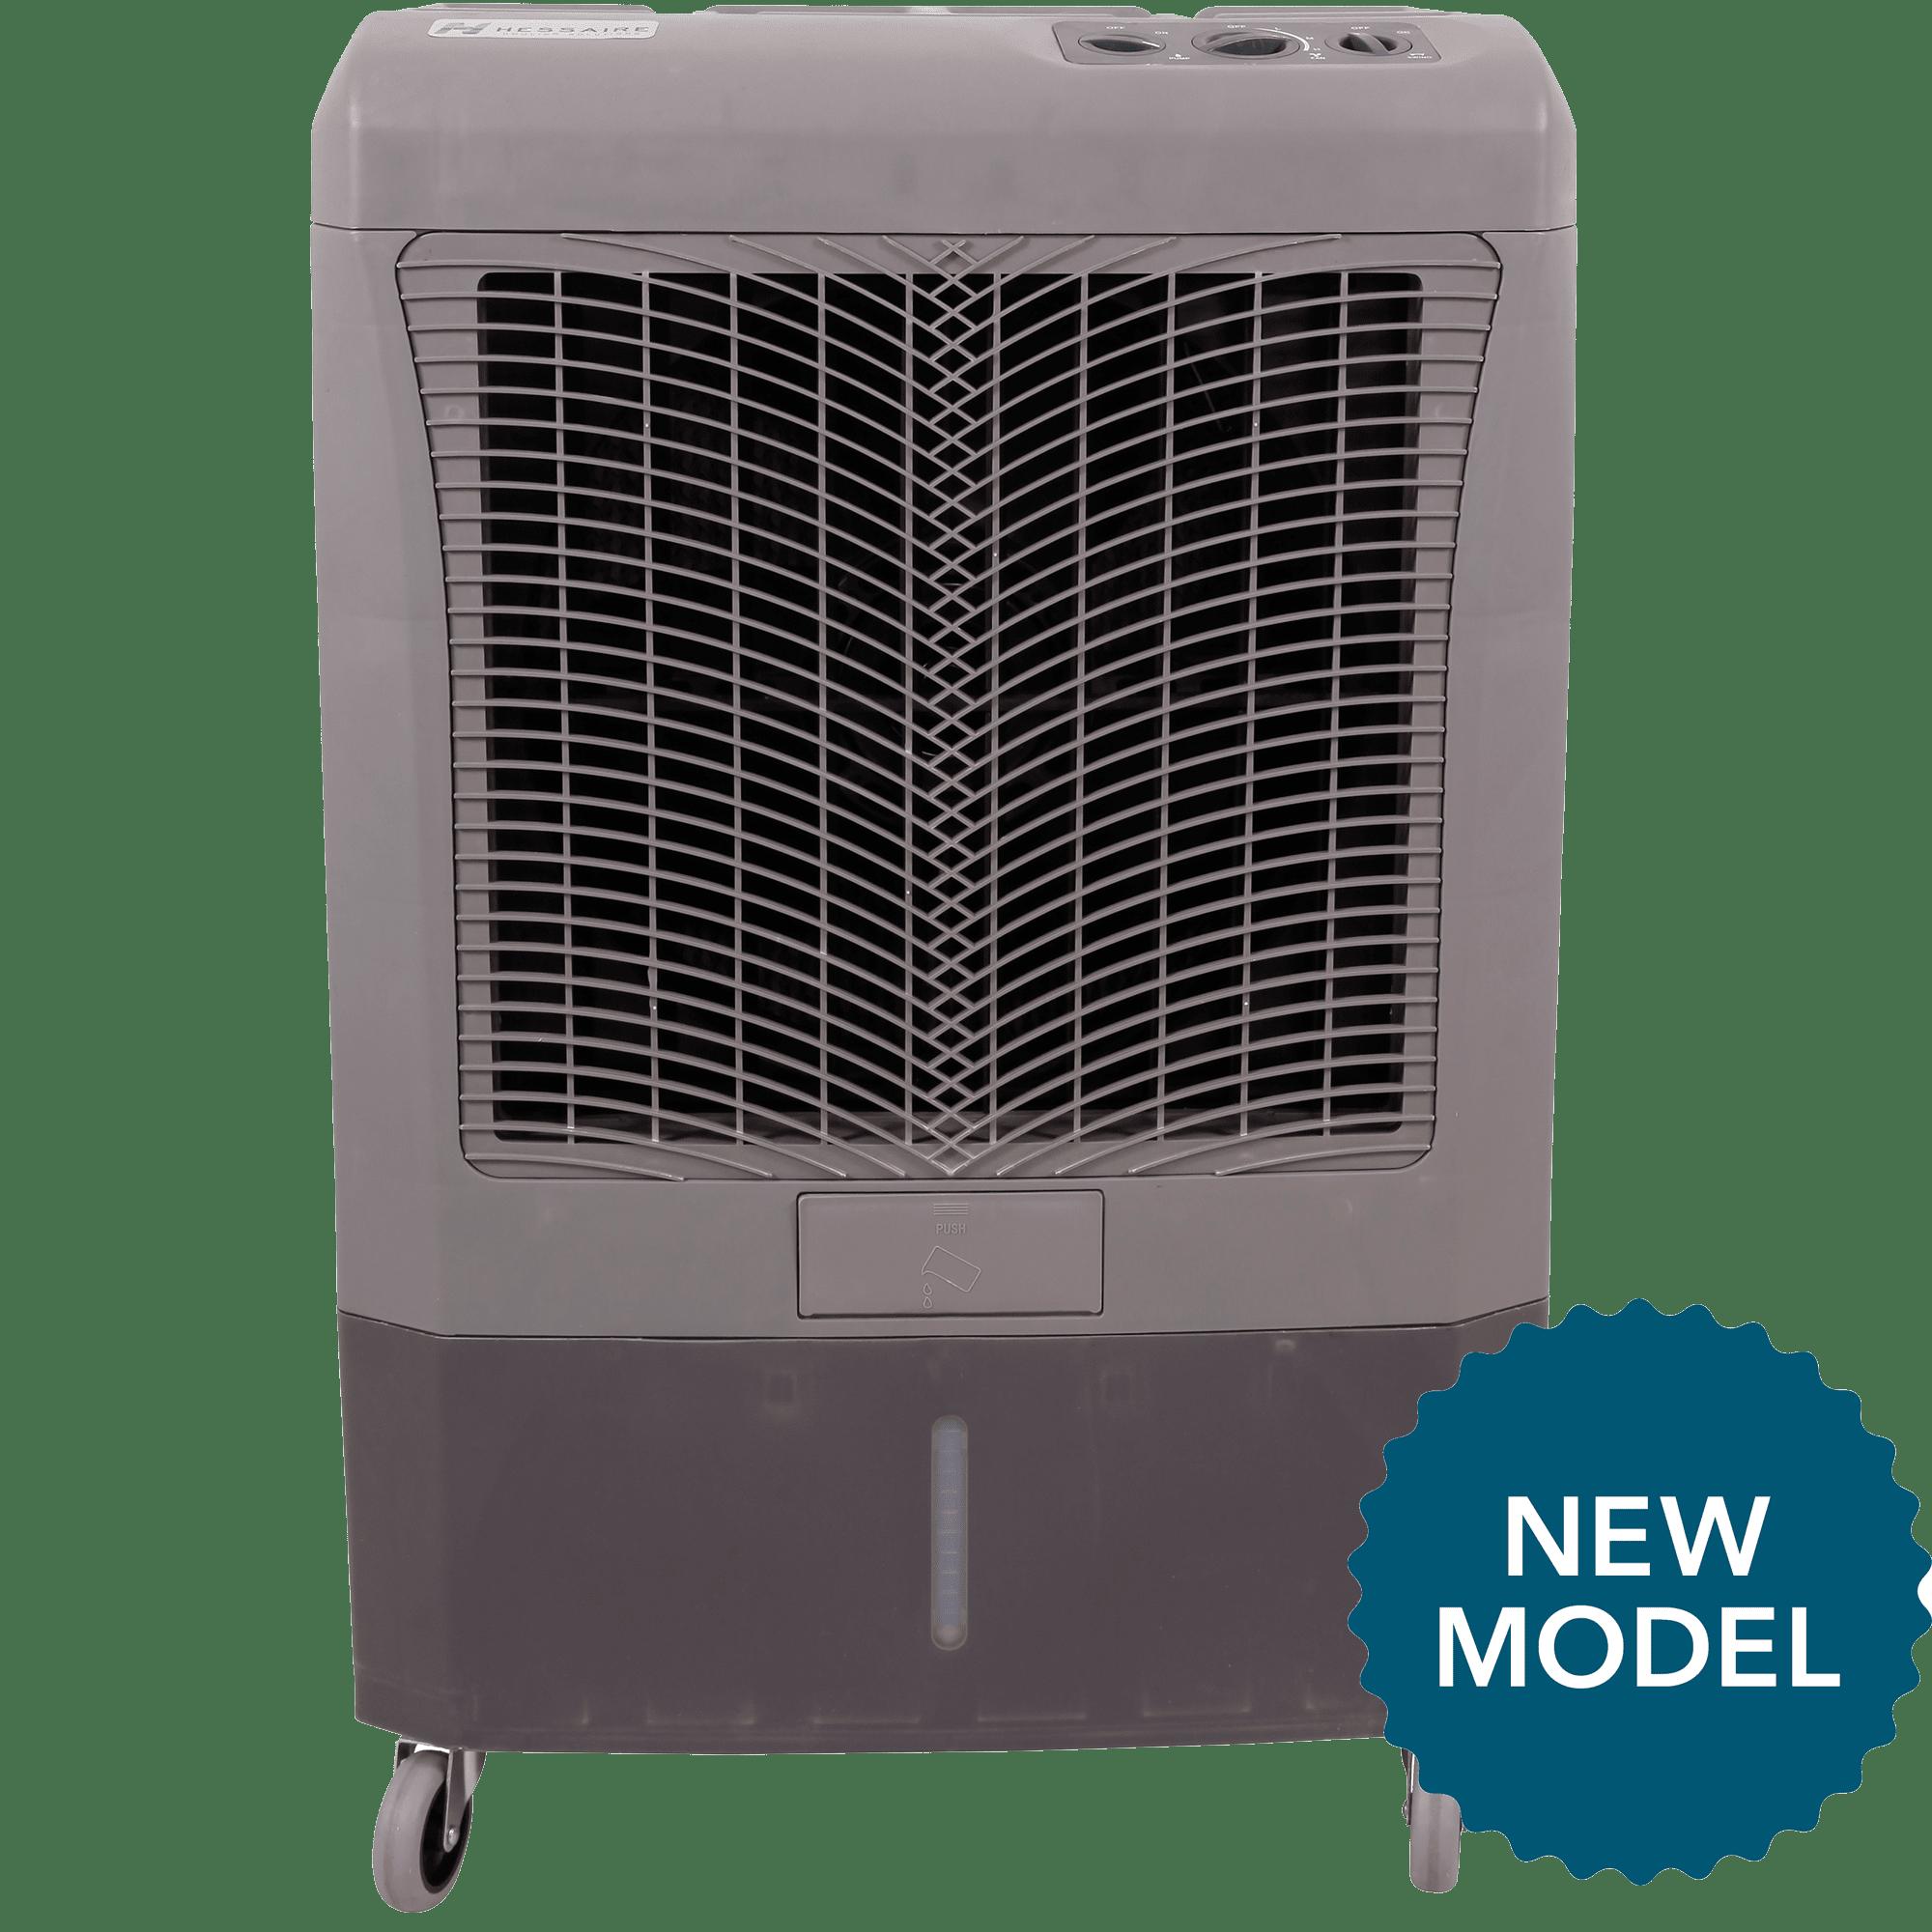 Hessaire Mc37m Portable Evaporative Cooler Sylvane